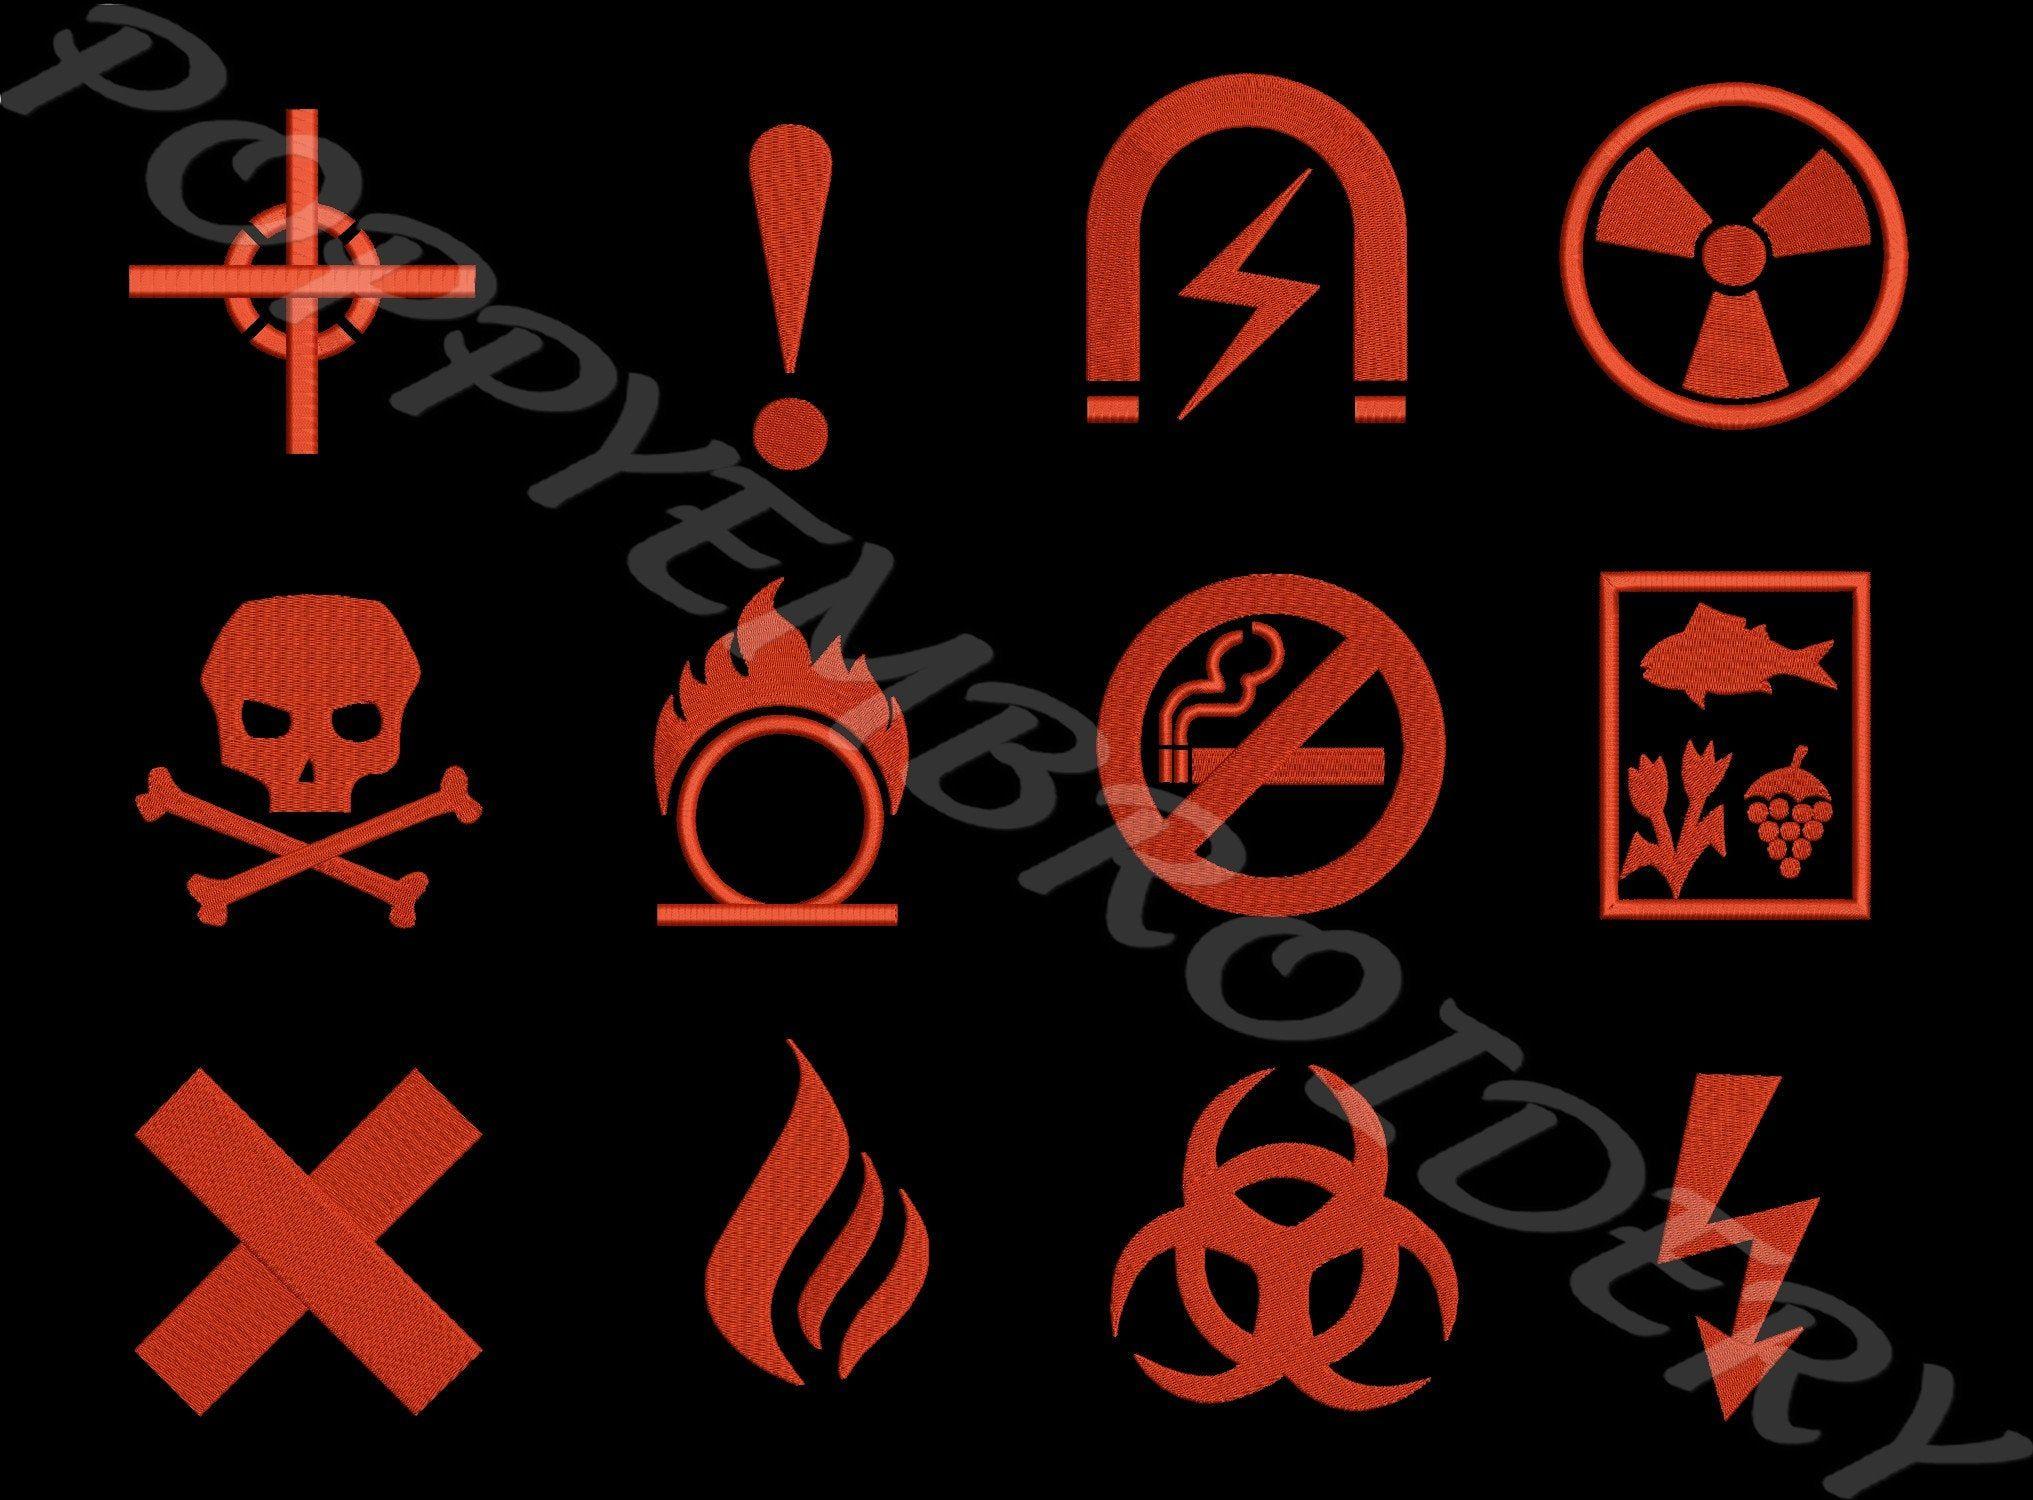 Hazard Symbol Design For Embroidery Machine Danger Motifs Pour